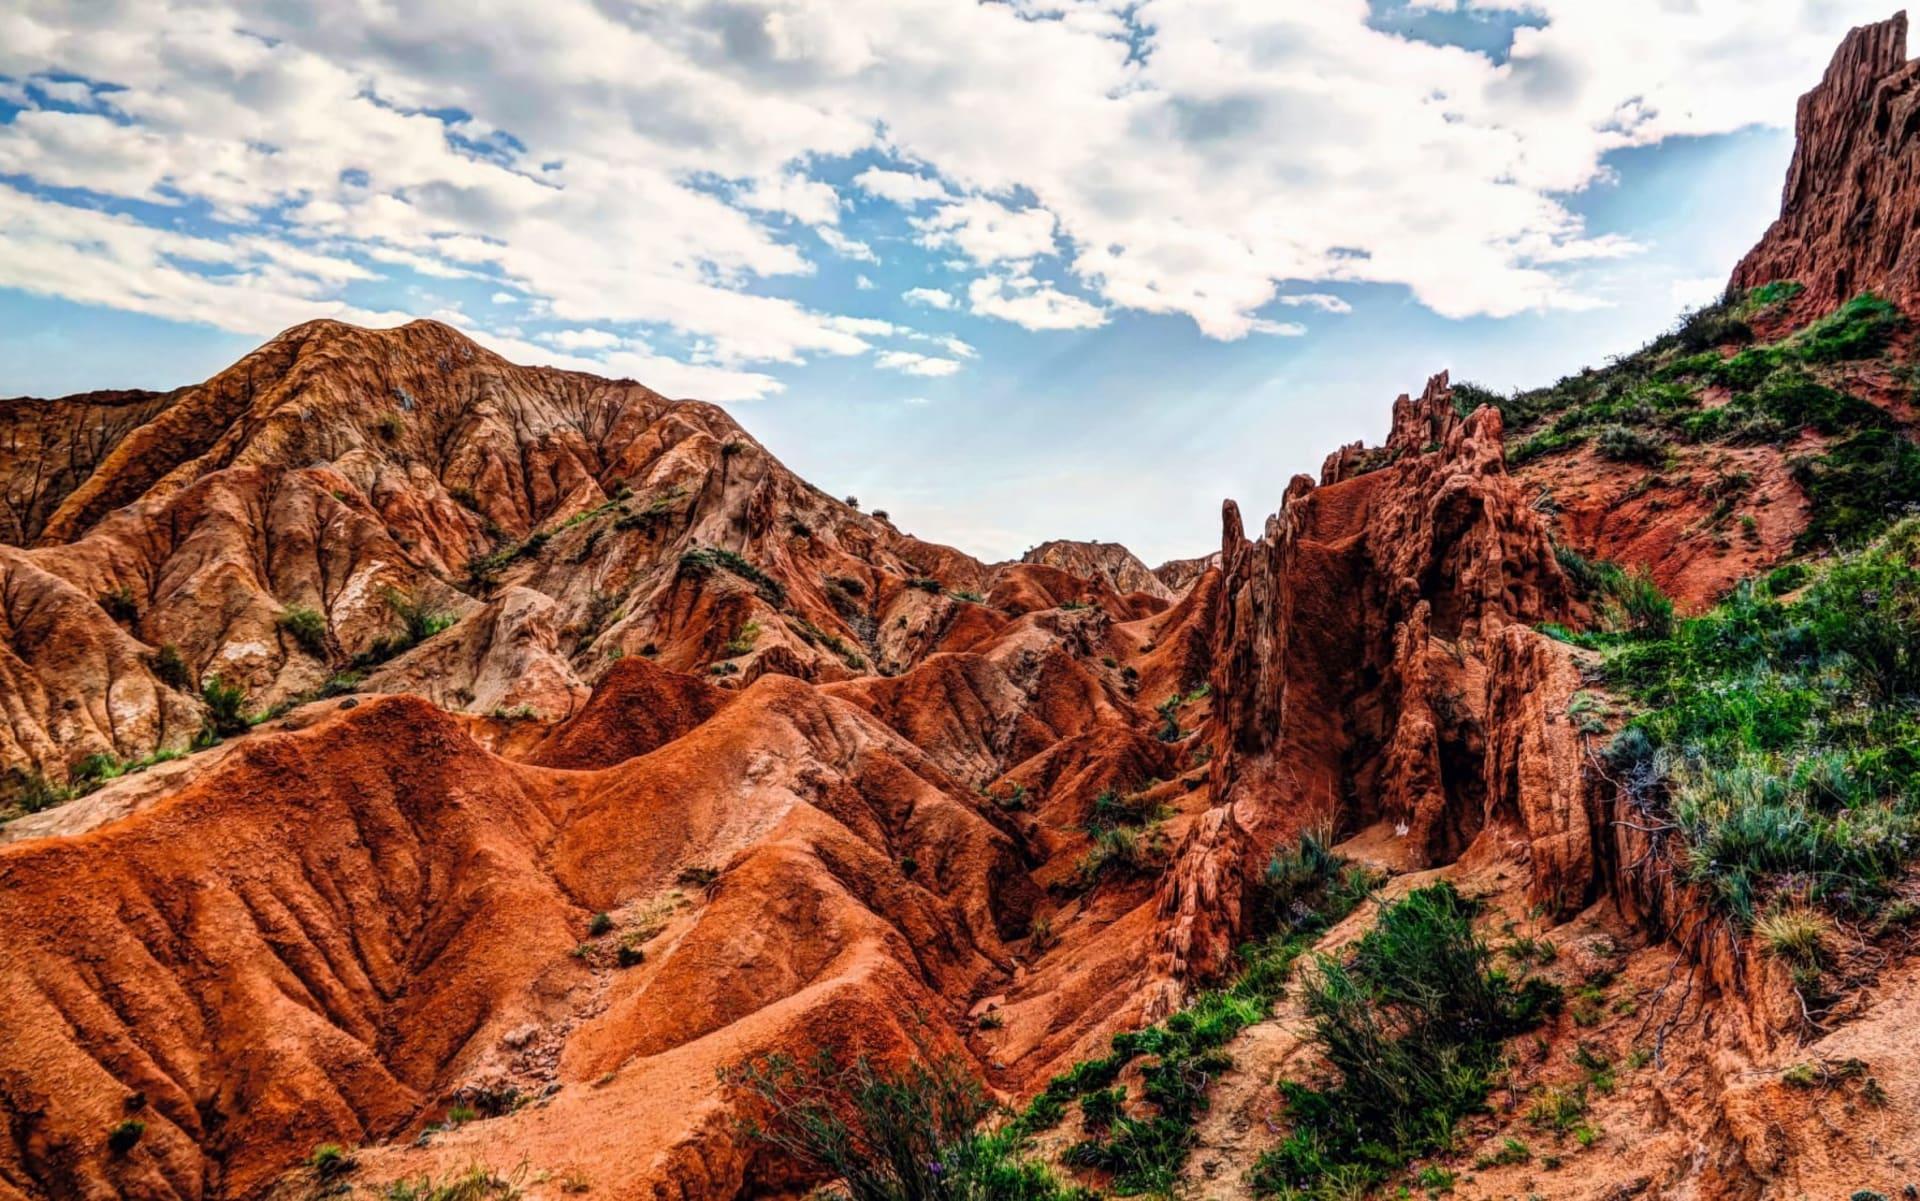 KIRA Gruppenreise: Natur pur in Kasachstan und Kirgistan ab Almaty: KI_Sakzka Canyon_shutterstock_532638562_Homo Cosmicos